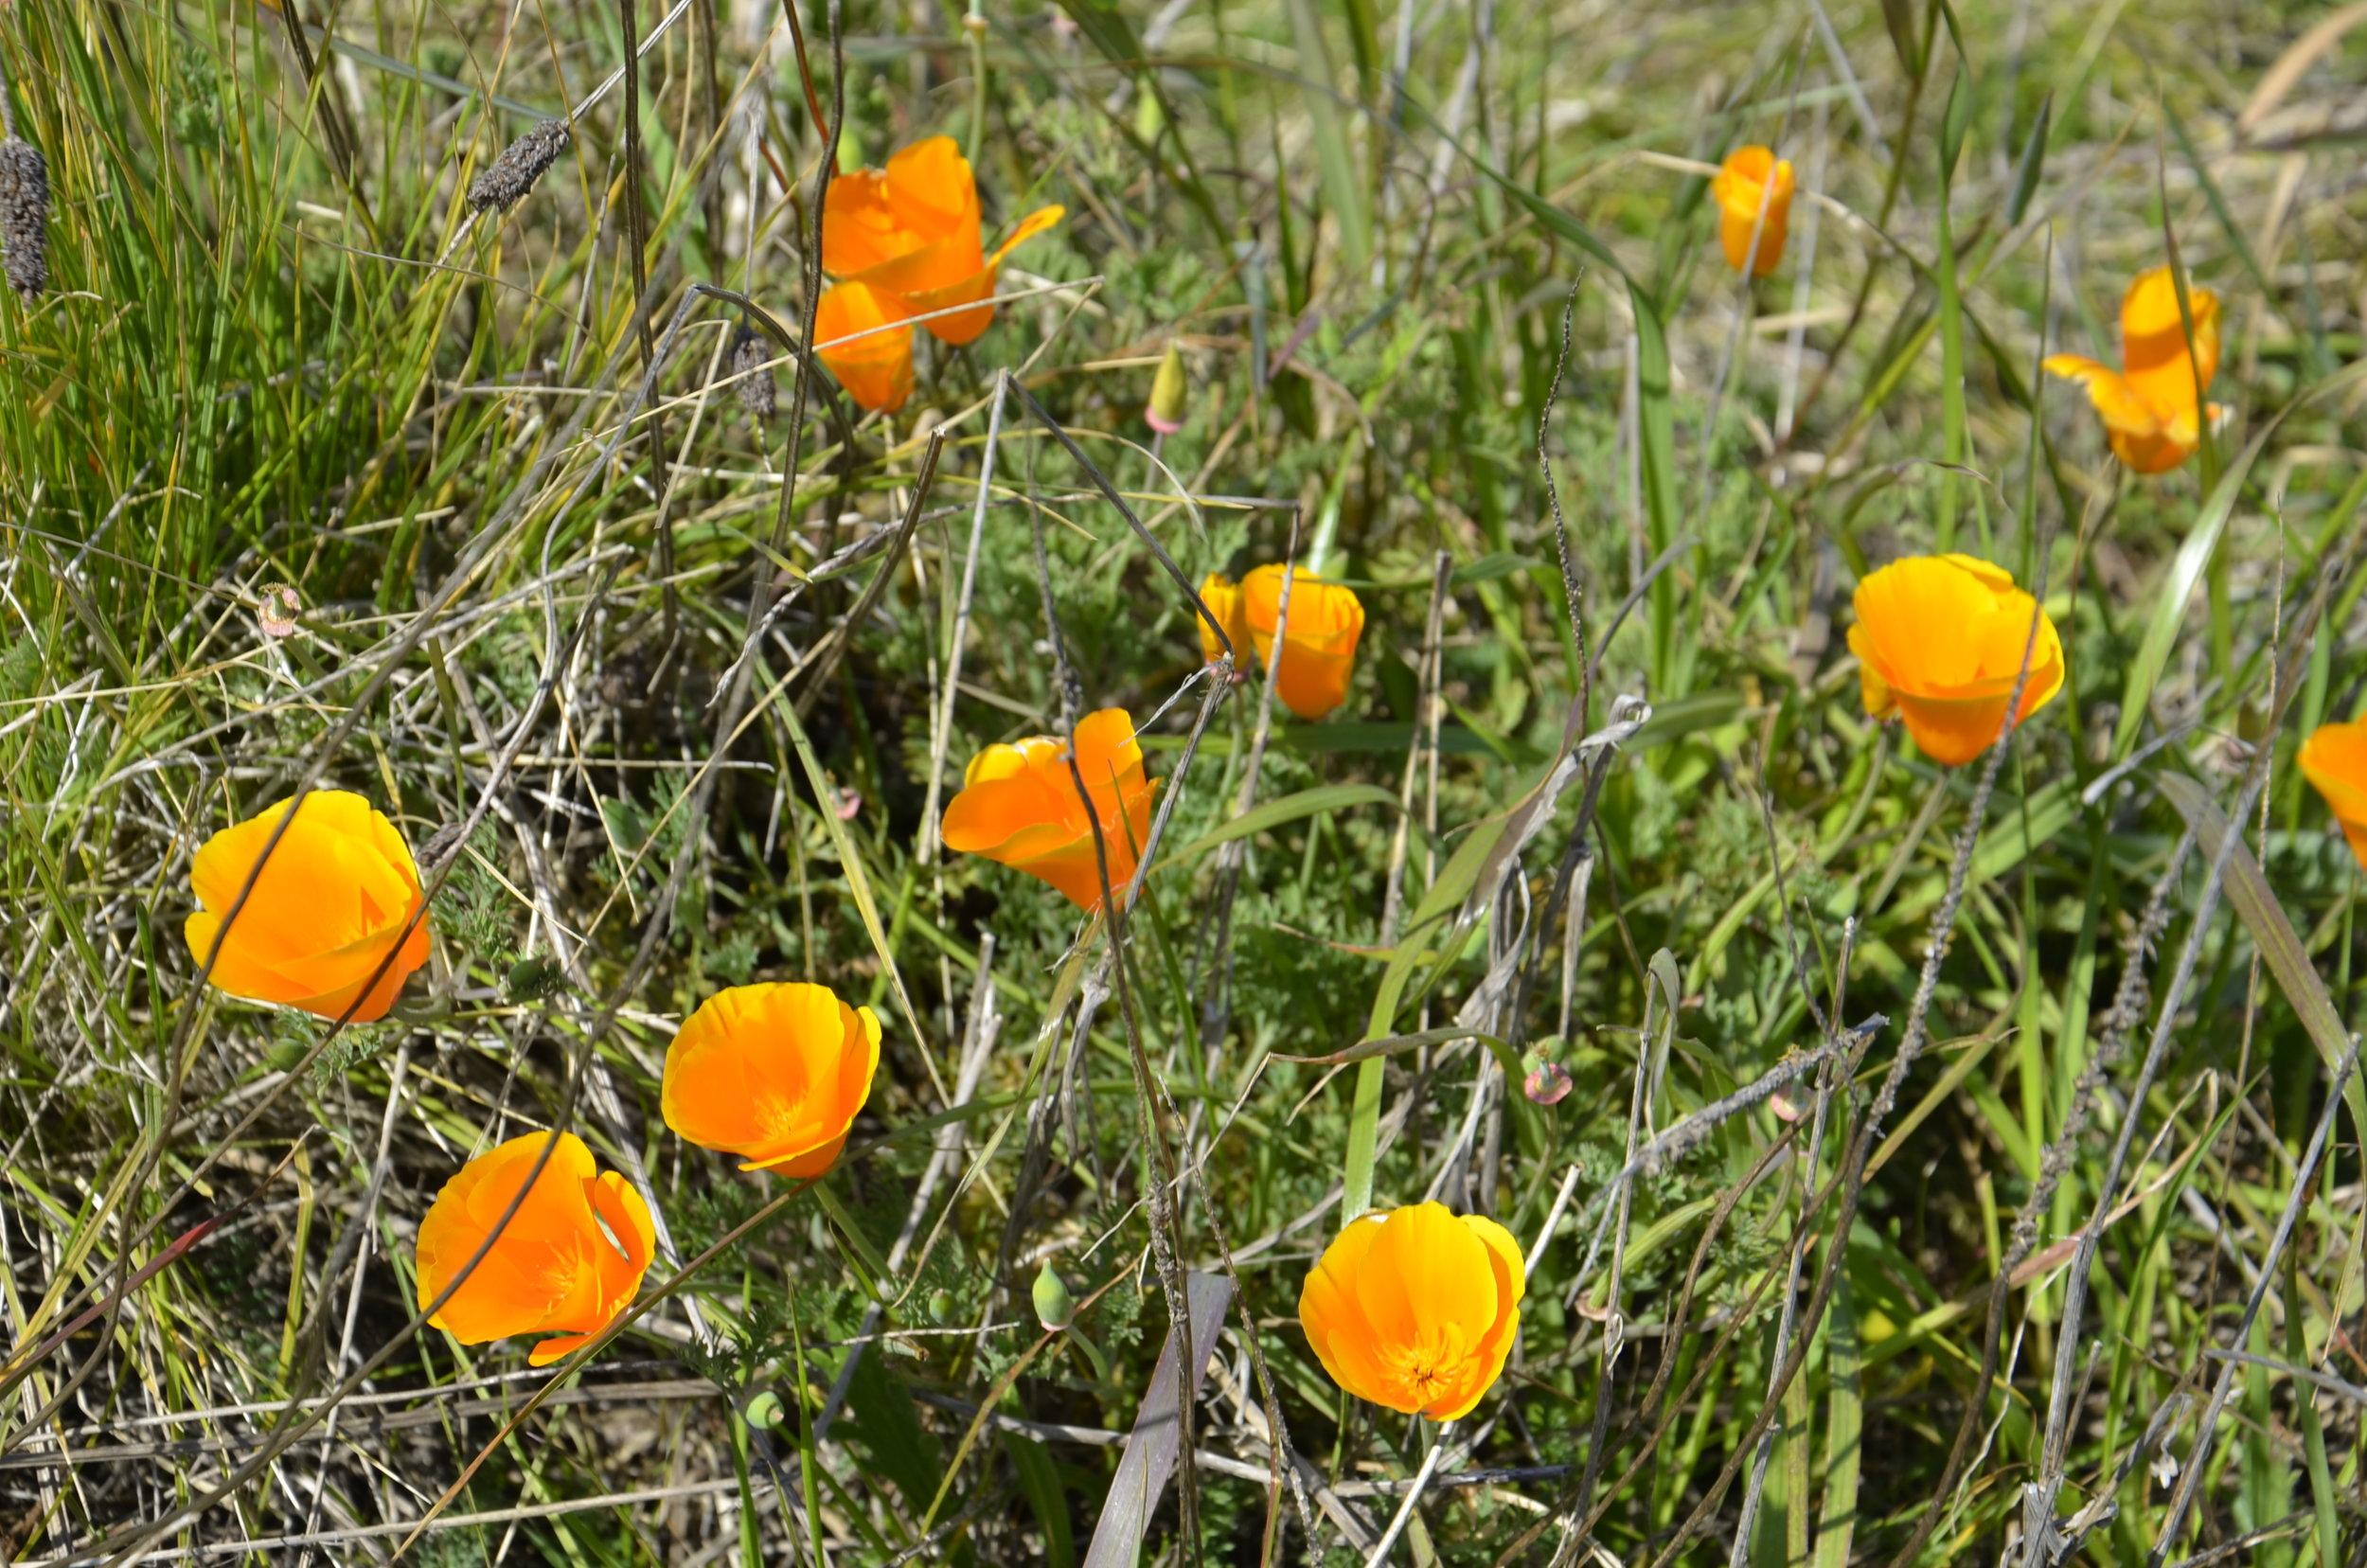 California poppies were blooming everywhere.